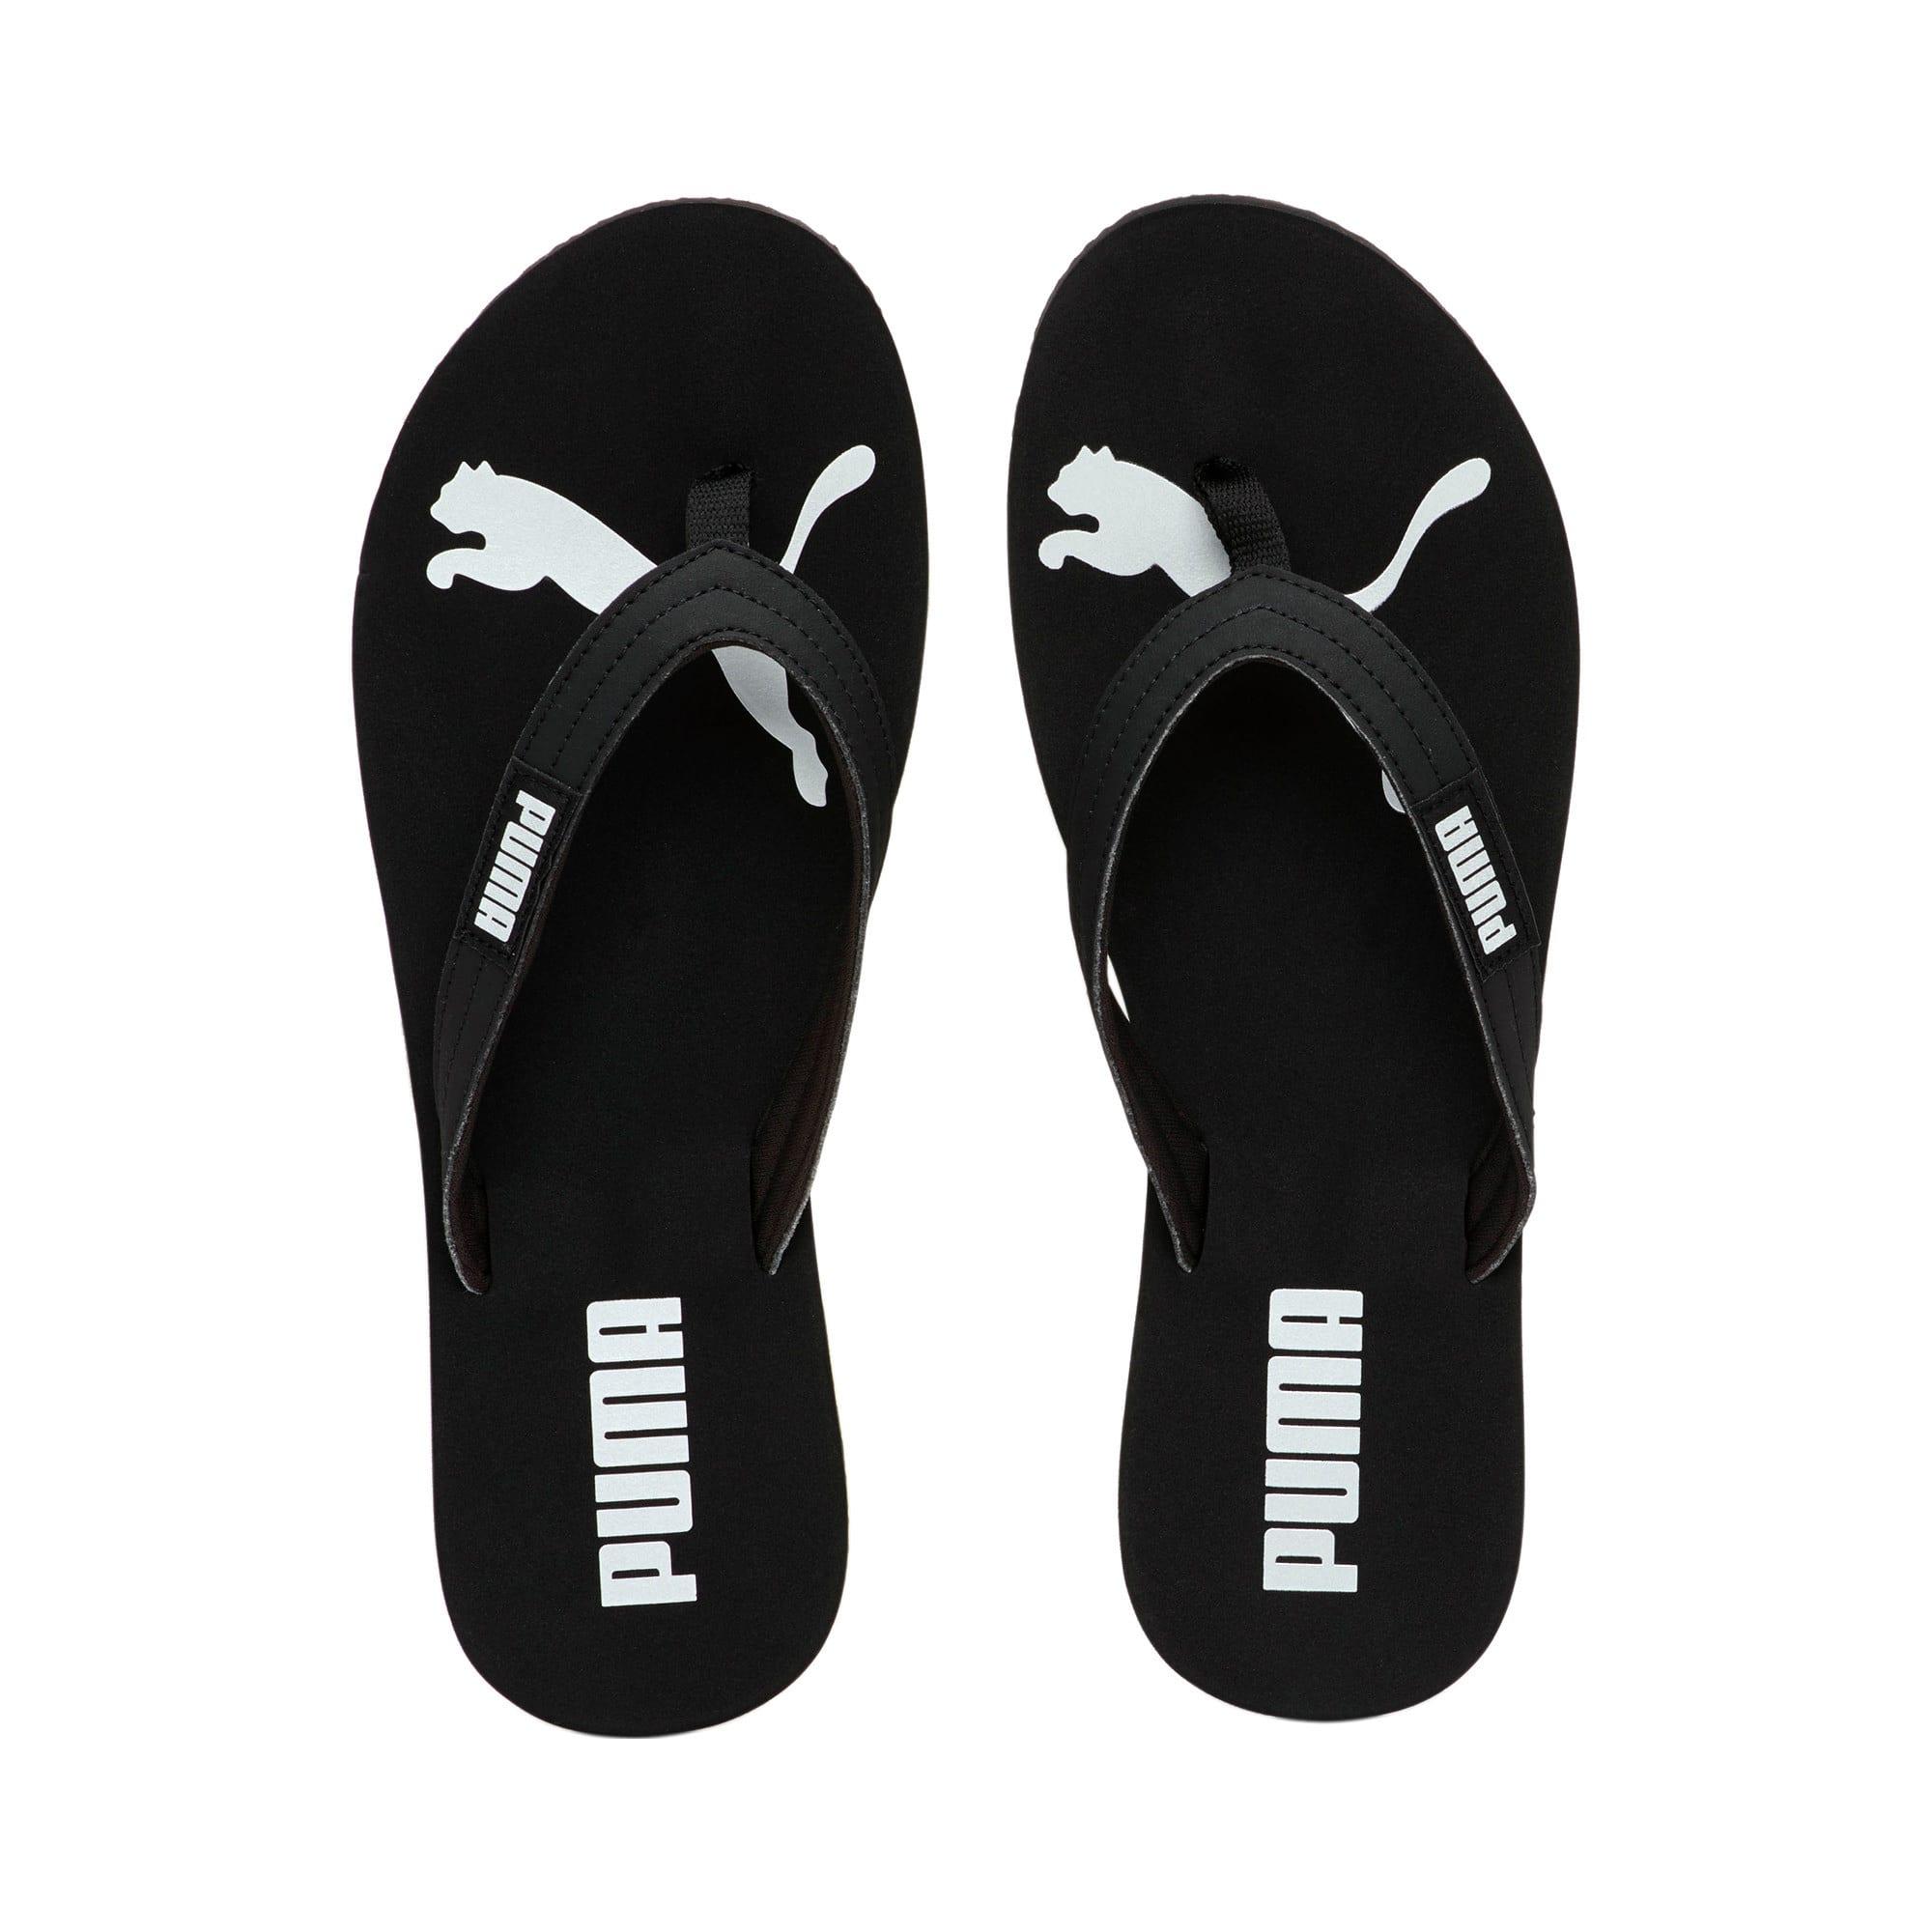 Thumbnail 6 of PUMA Cozy Flip Women's Sandals, Puma Black-Puma Silver, medium